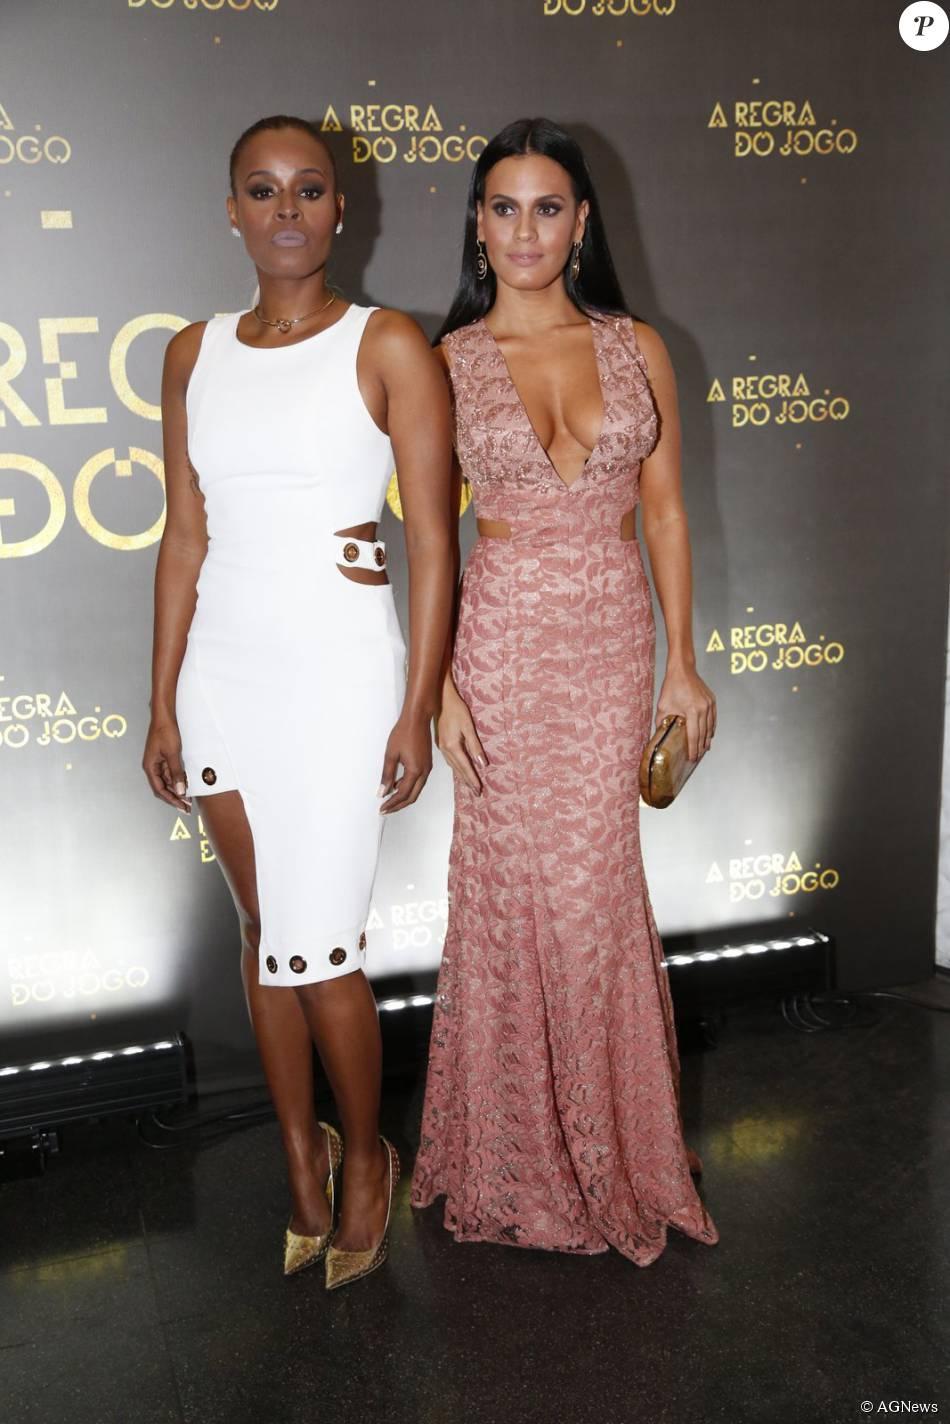 Roberta Rodrigues usa vestido com recortes assimétricos Skazi, sapato Jimmy Choo e  joias Eleonora Hsiung Ateliê. Leticia Lima apostou no decote e recortes na altura da cintura